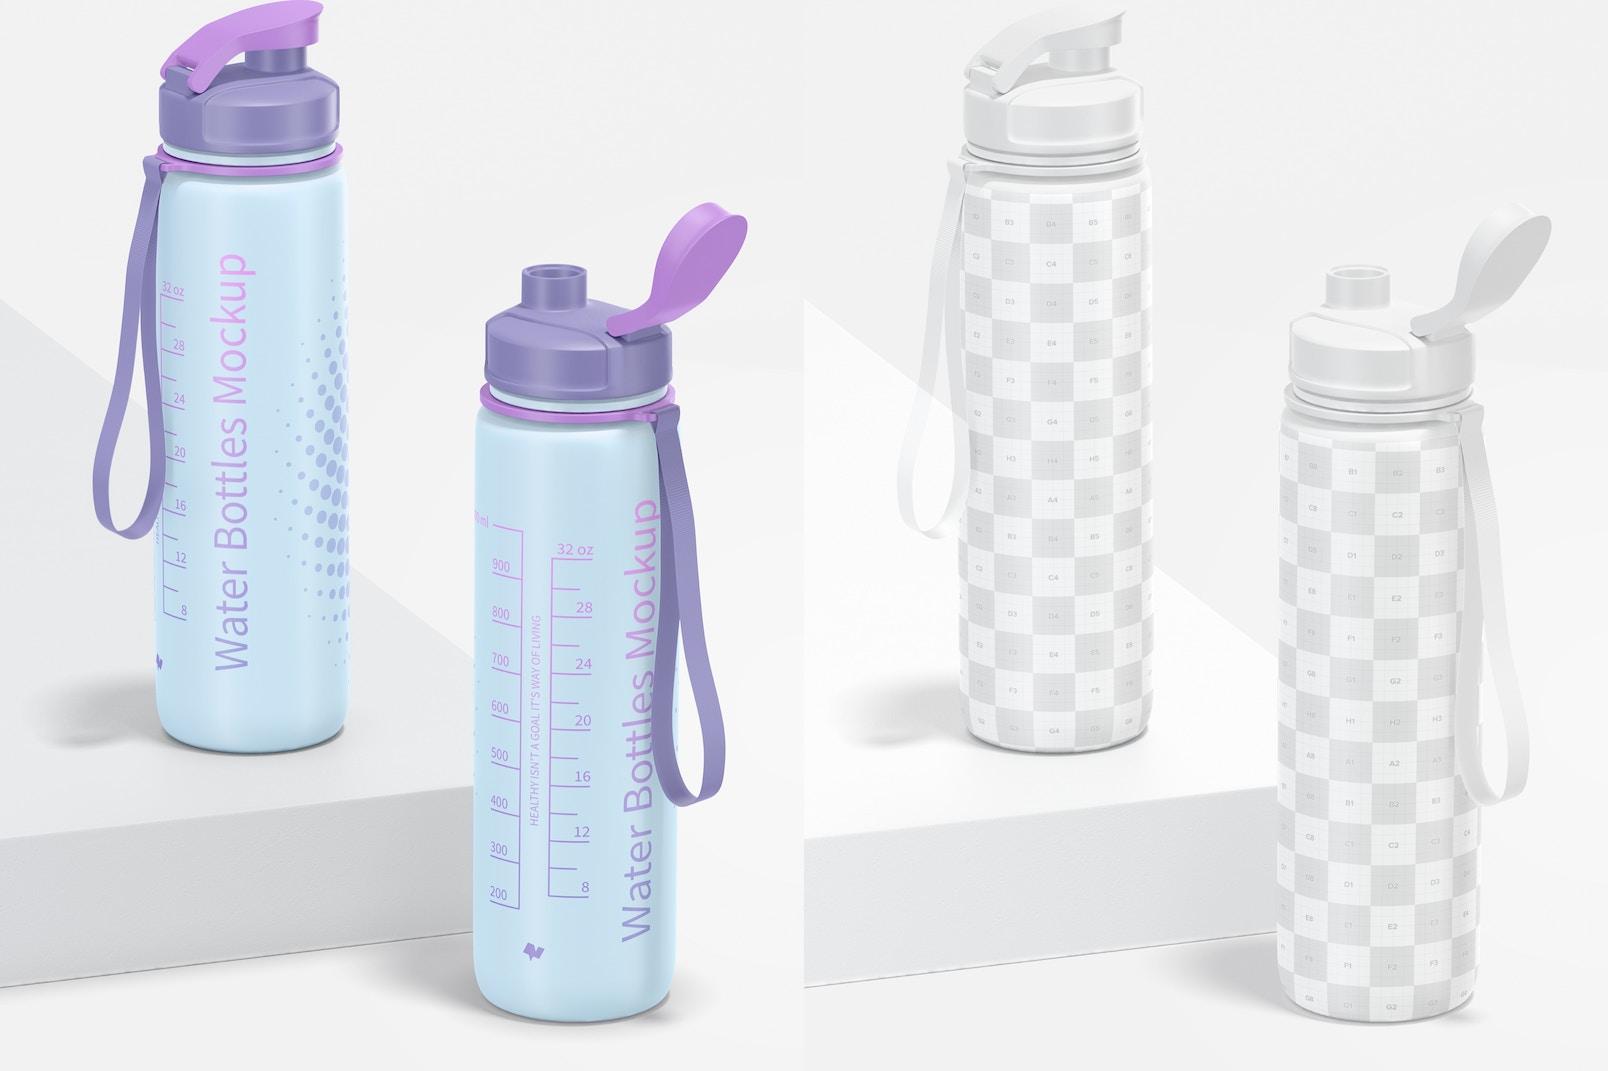 32 oz Water Bottles Mockup